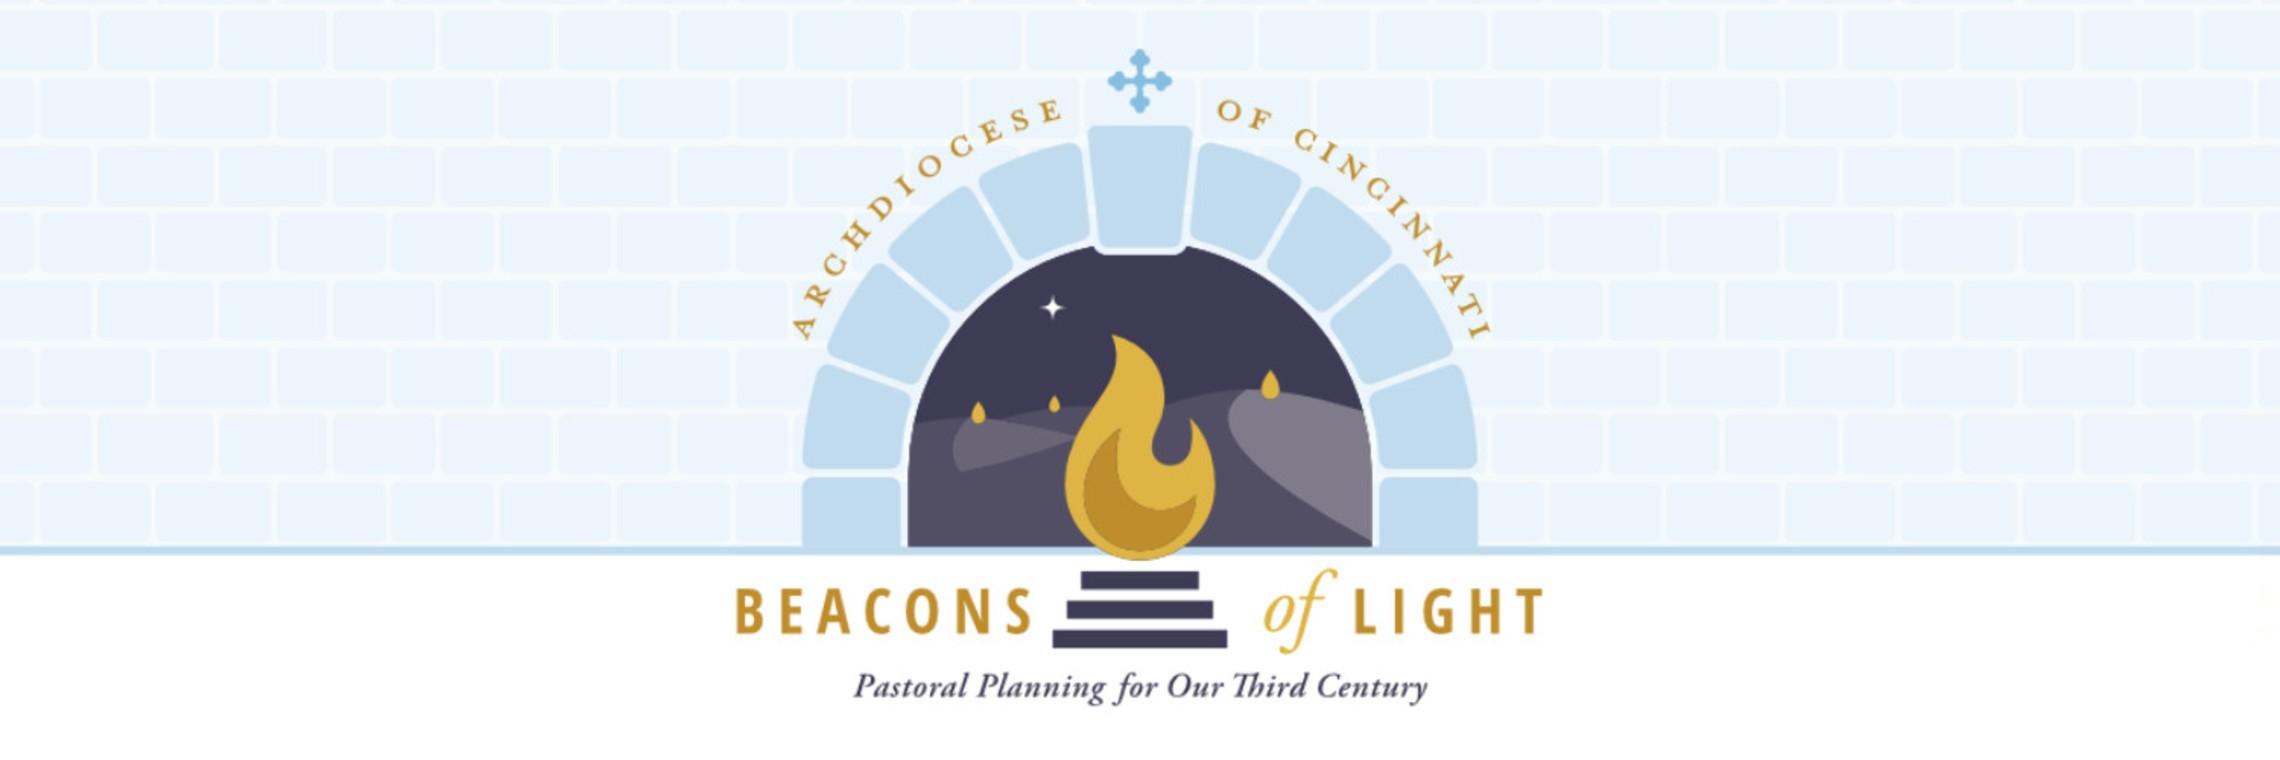 Beacons of Light